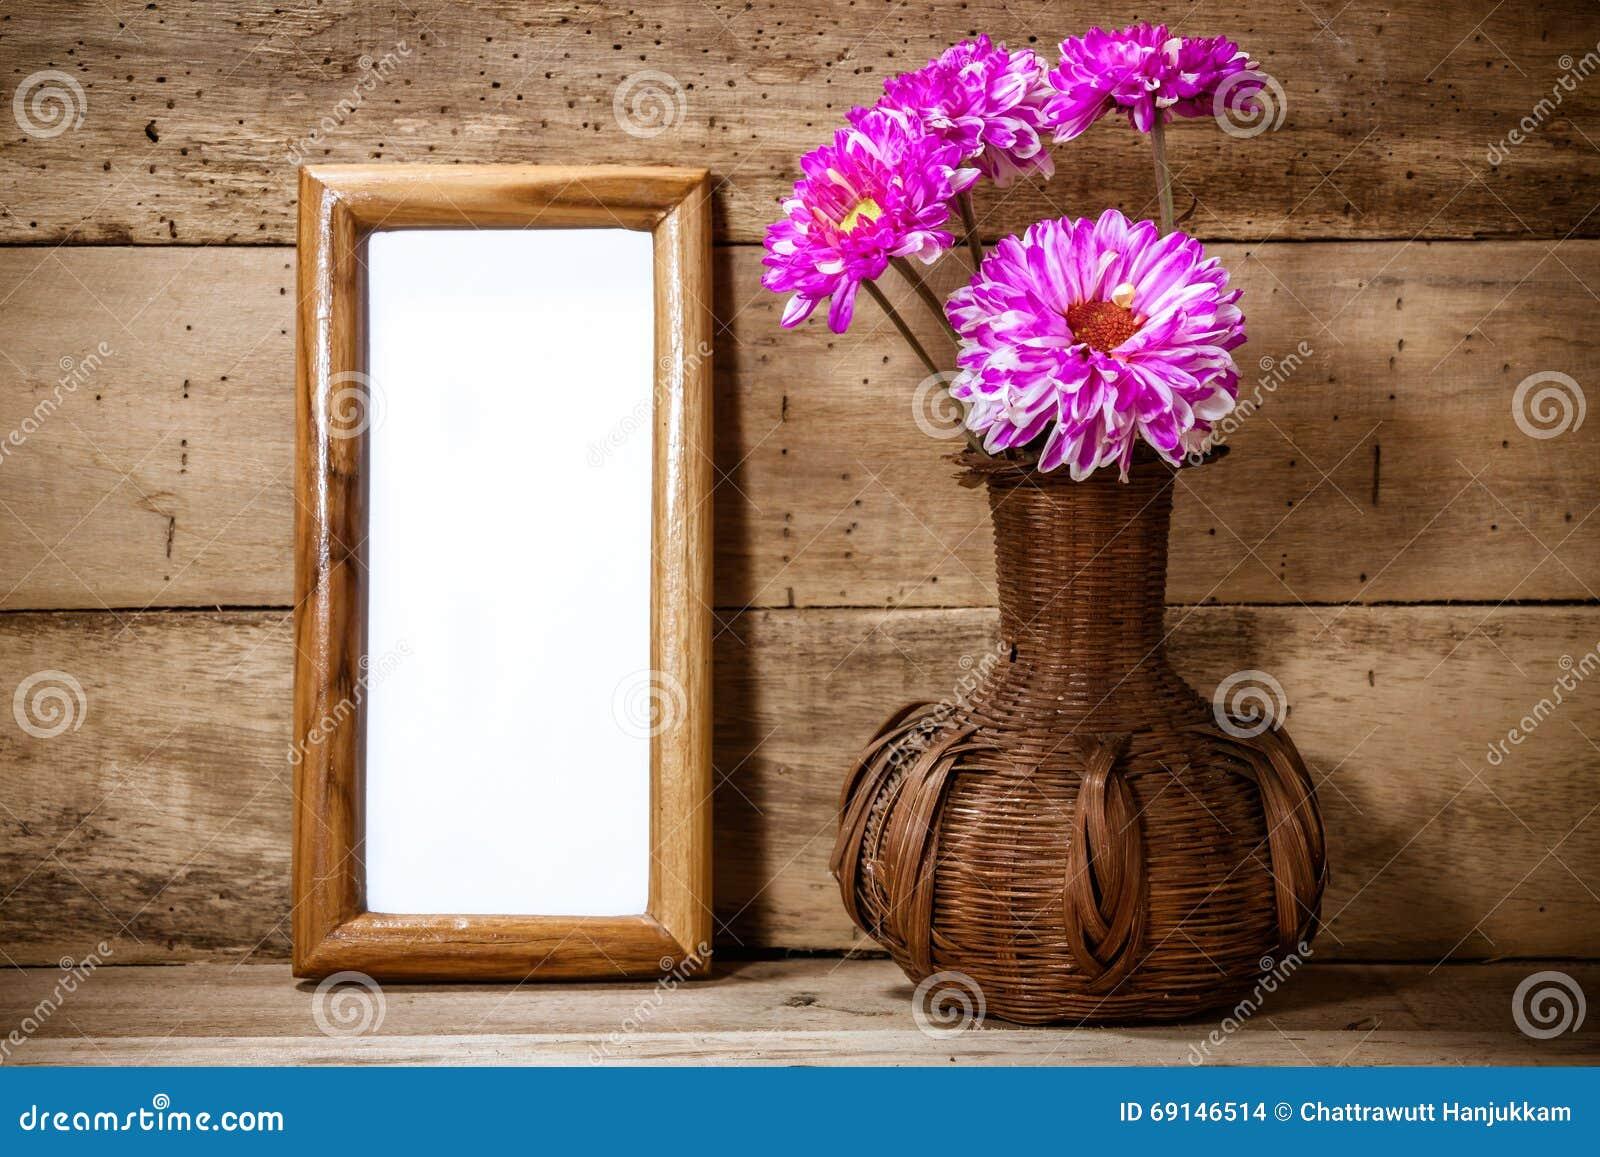 Photo framebeautiful pink flower in vase on wood background photo framebeautiful pink flower in vase on wood background floridaeventfo Images